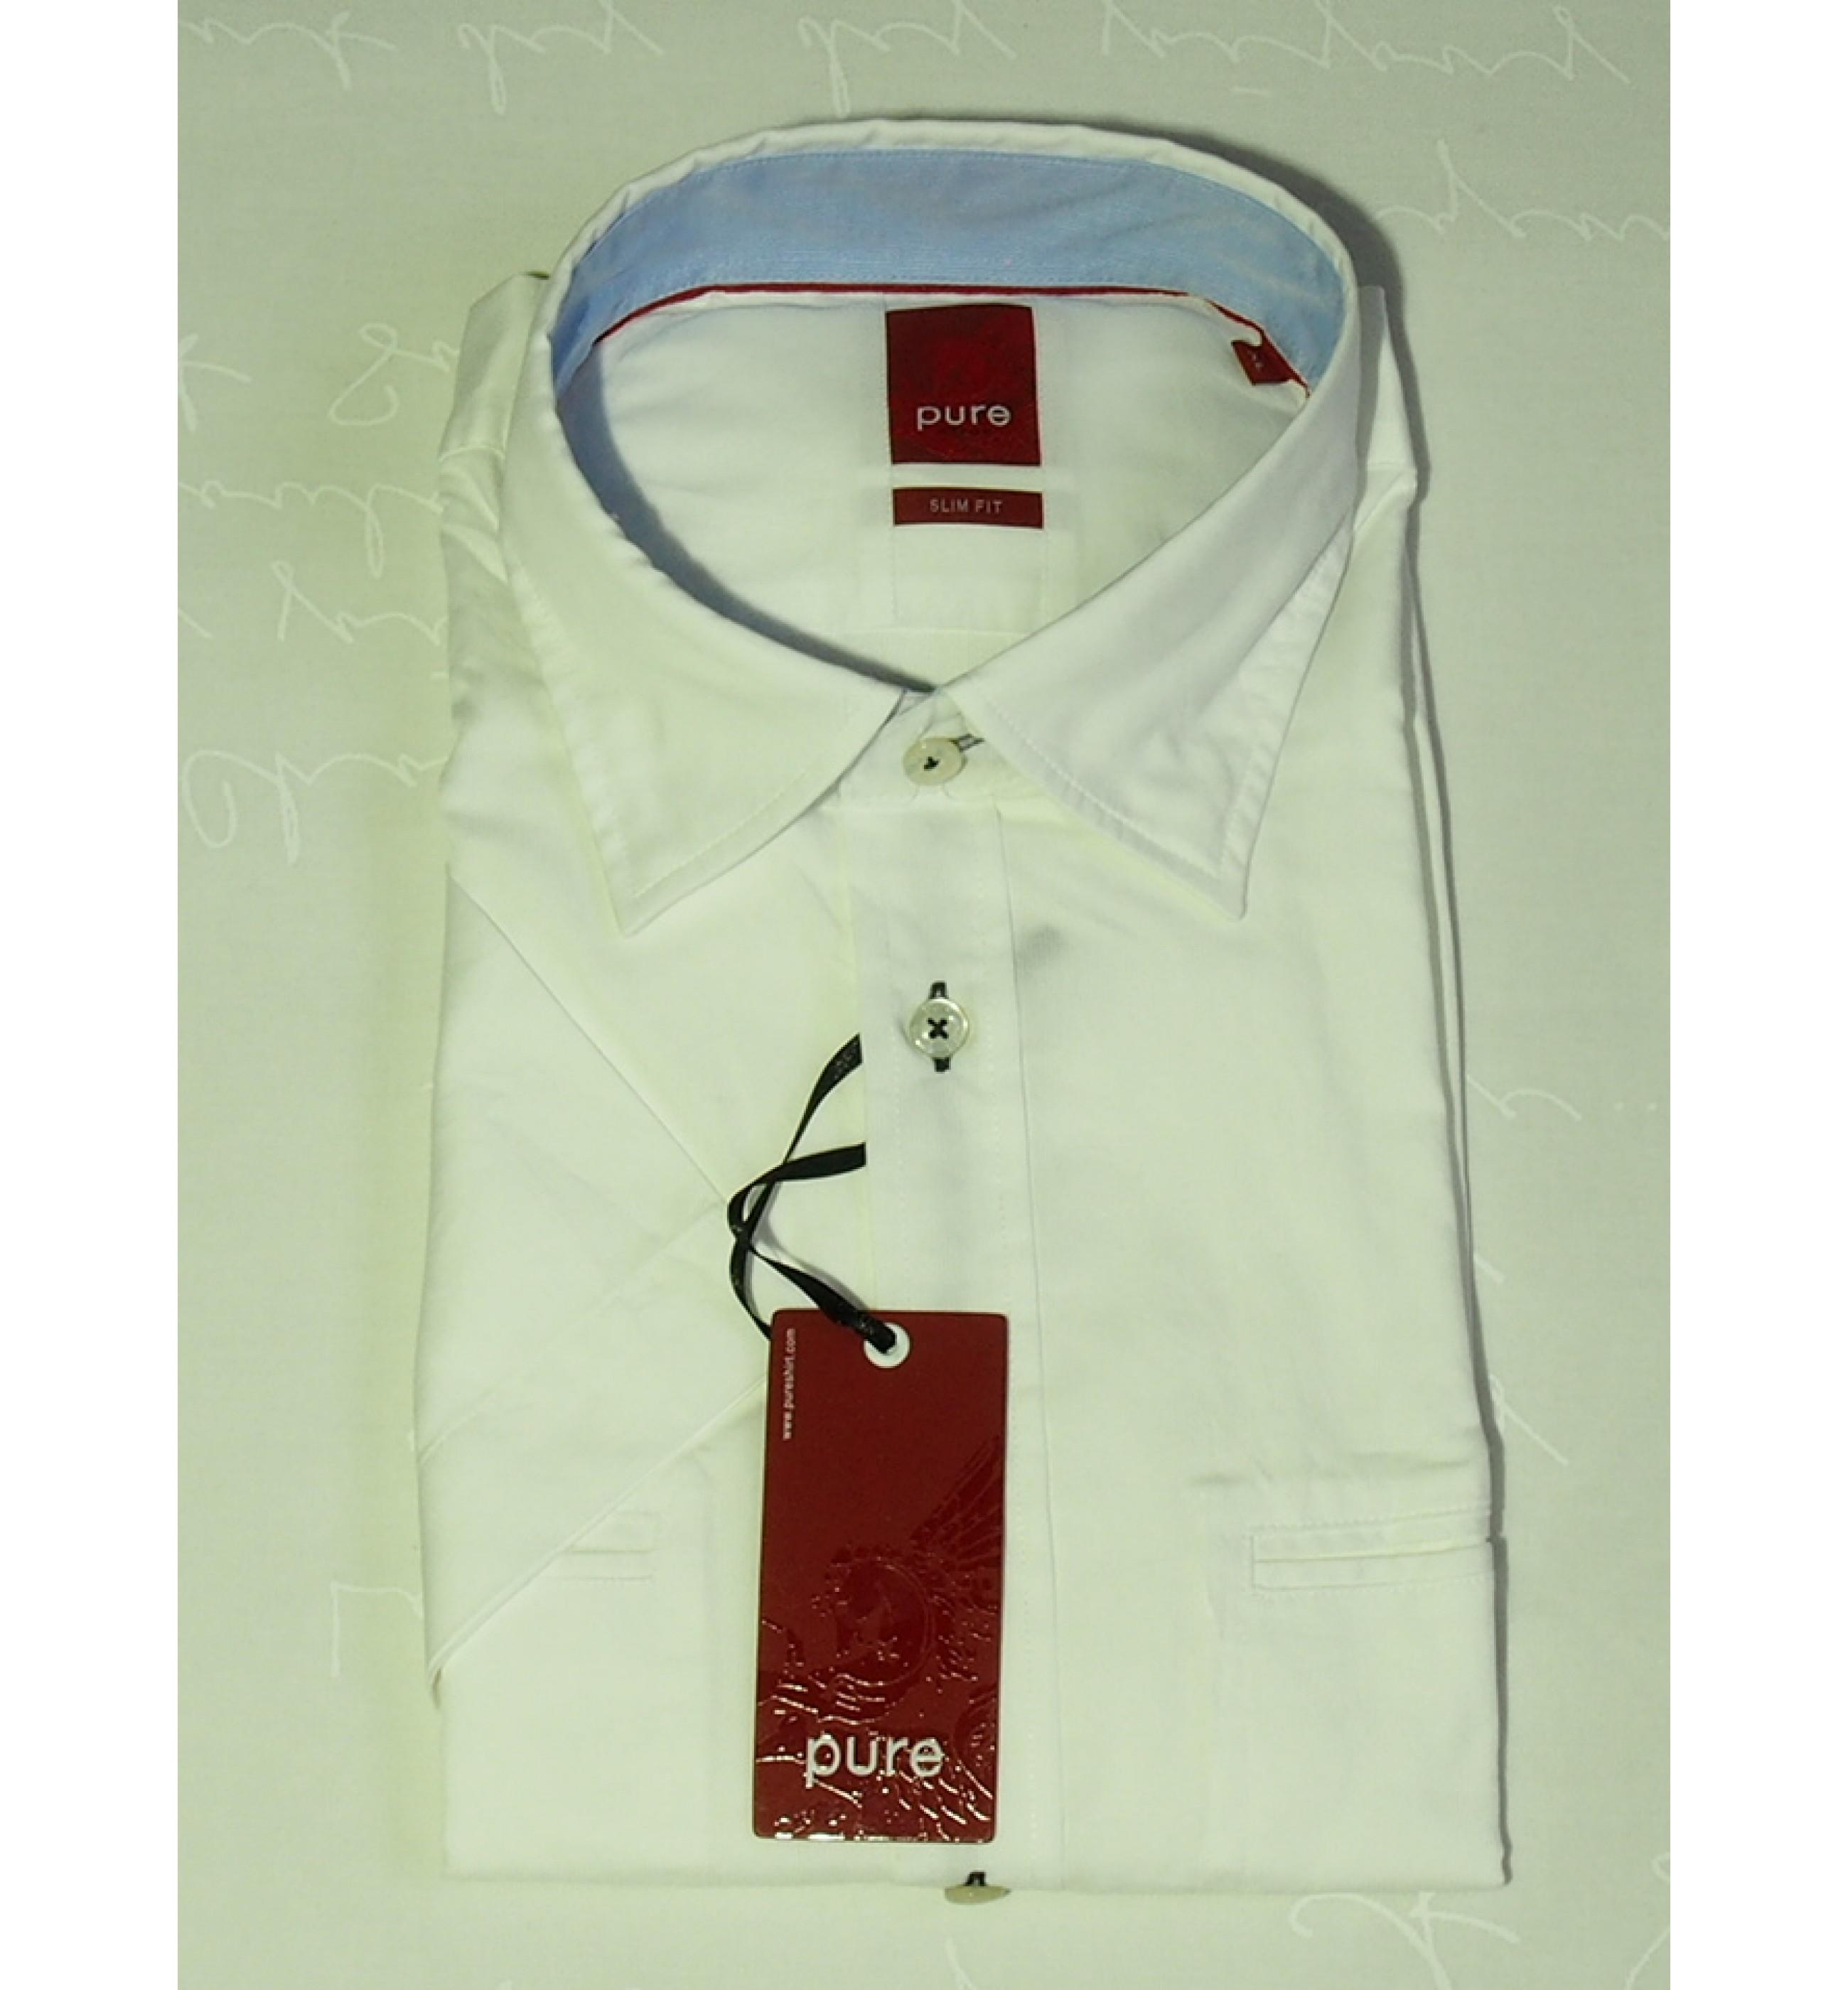 Мужская рубашка Pure 71571 4611 90